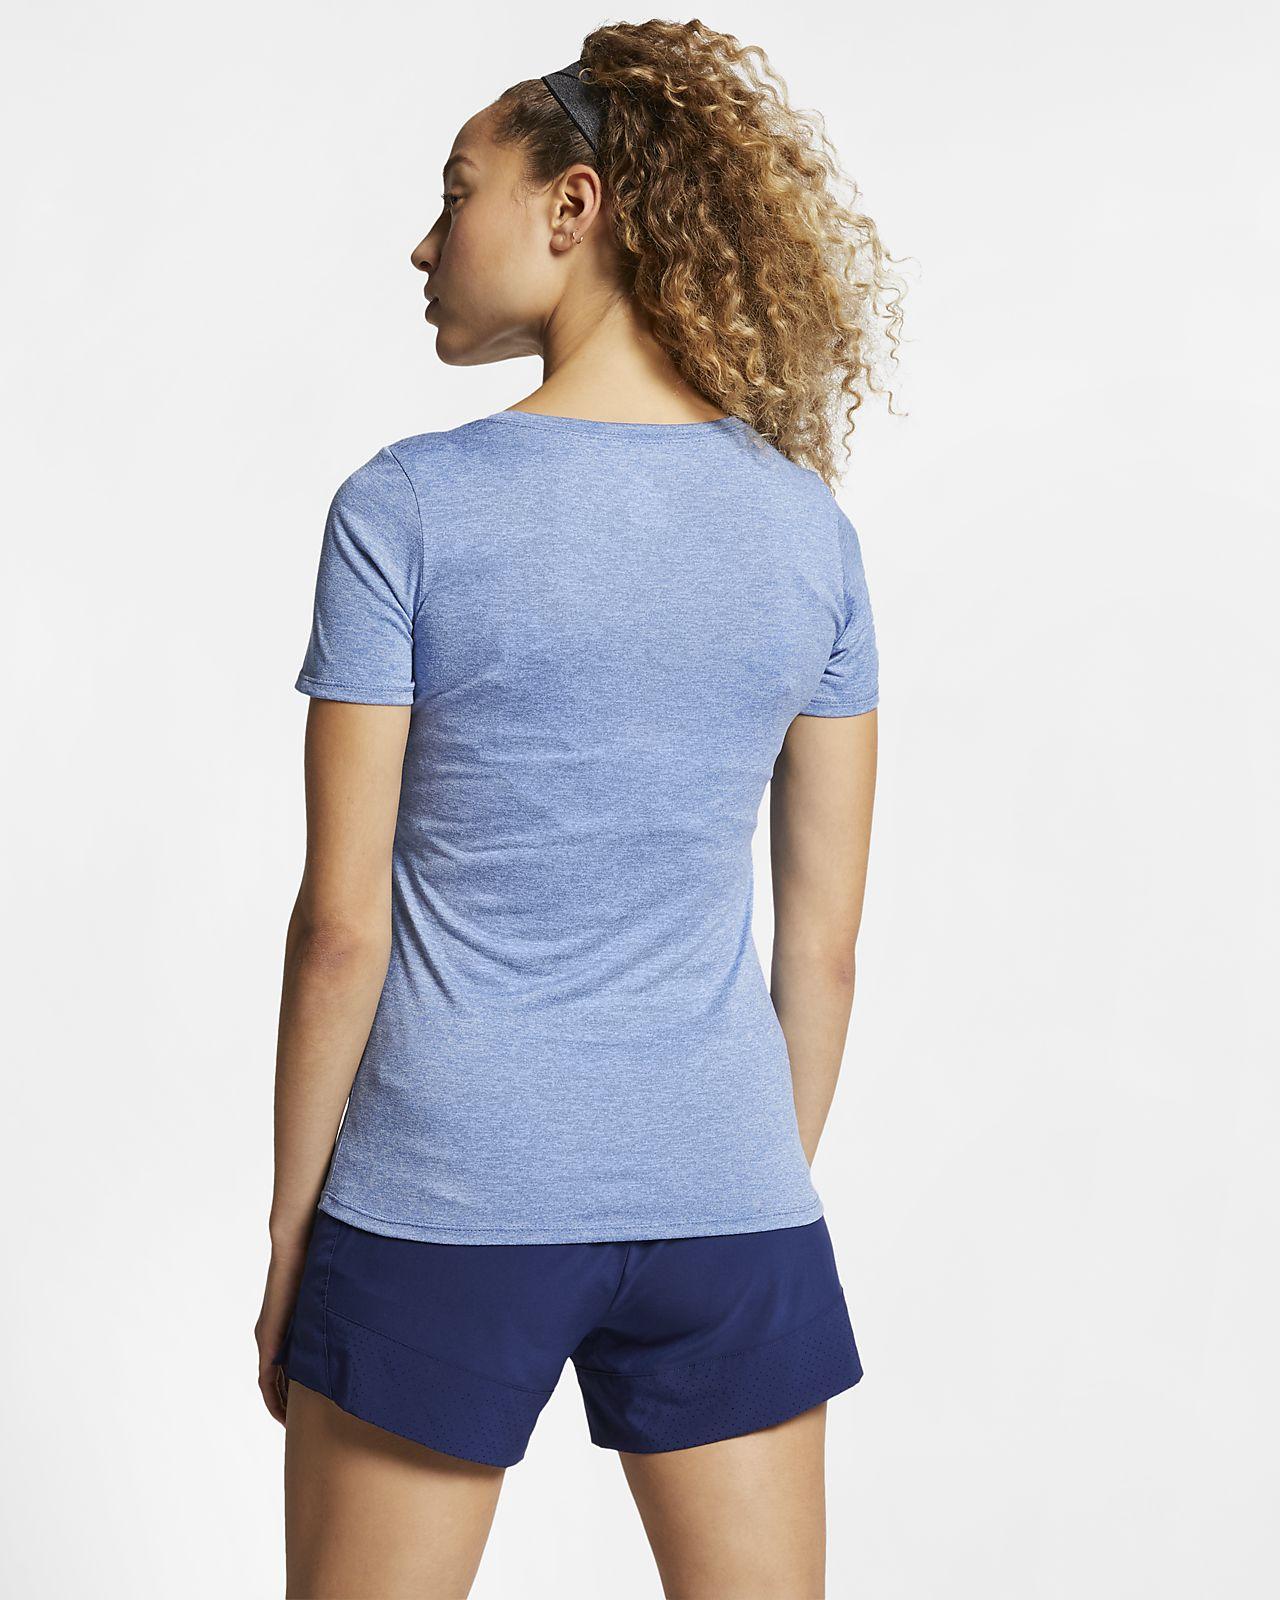 4c2e64bd4a27 Nike Dry Women s Training T-Shirt. Nike.com